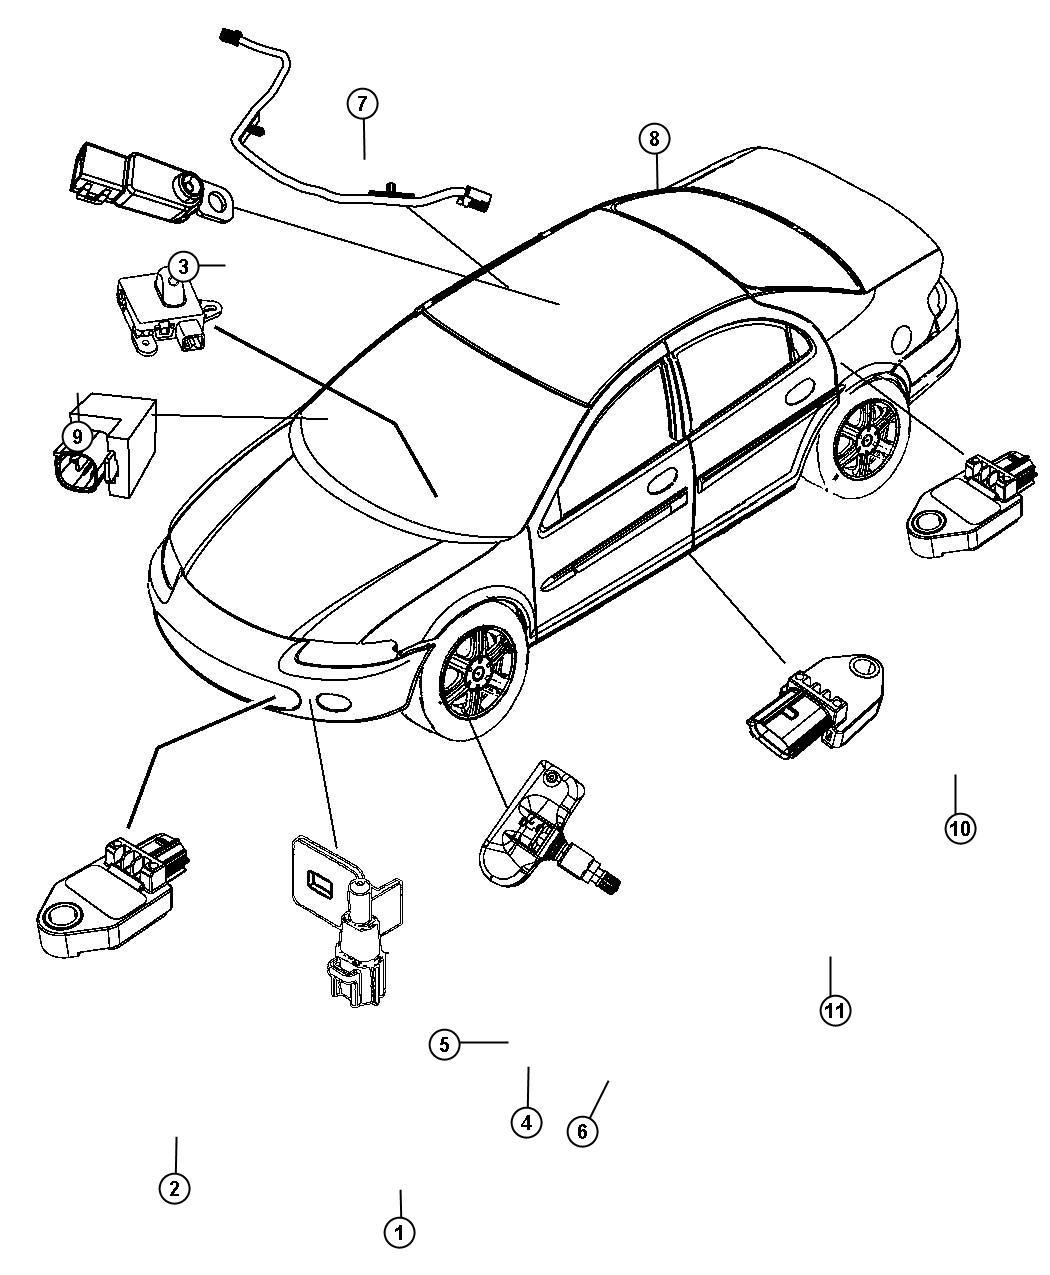 1985 honda shadow wiring diagram on honda ascot ft500 wiring diagram